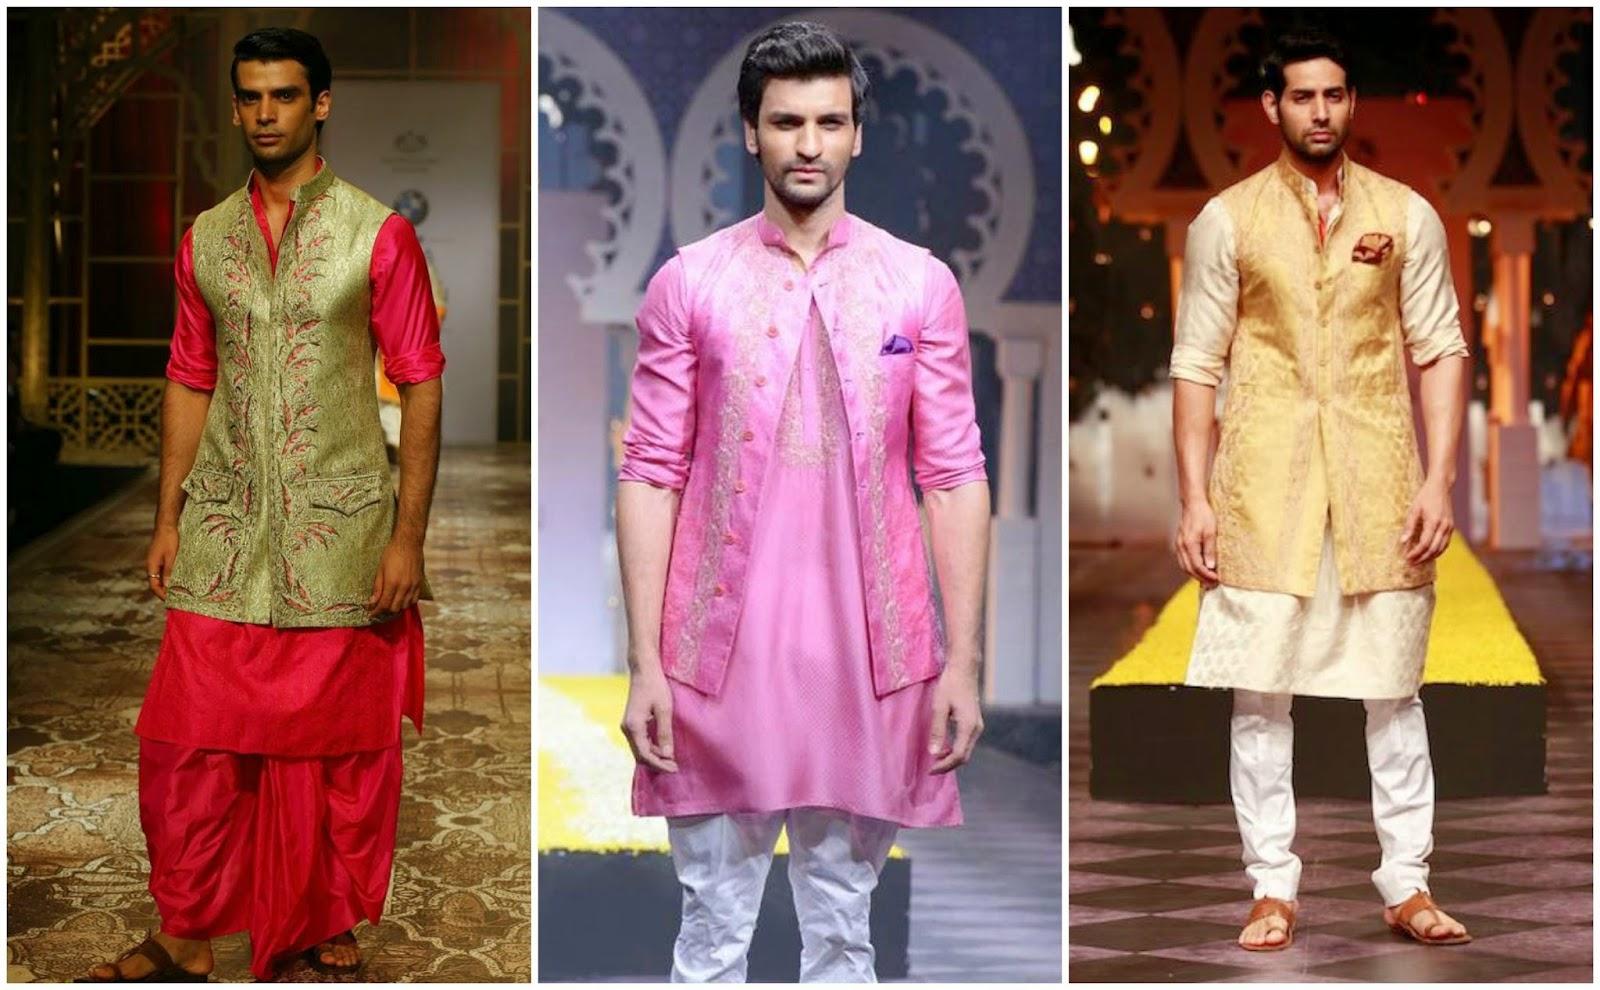 Raghavendra Rathore waistcoats and waistcoat sets